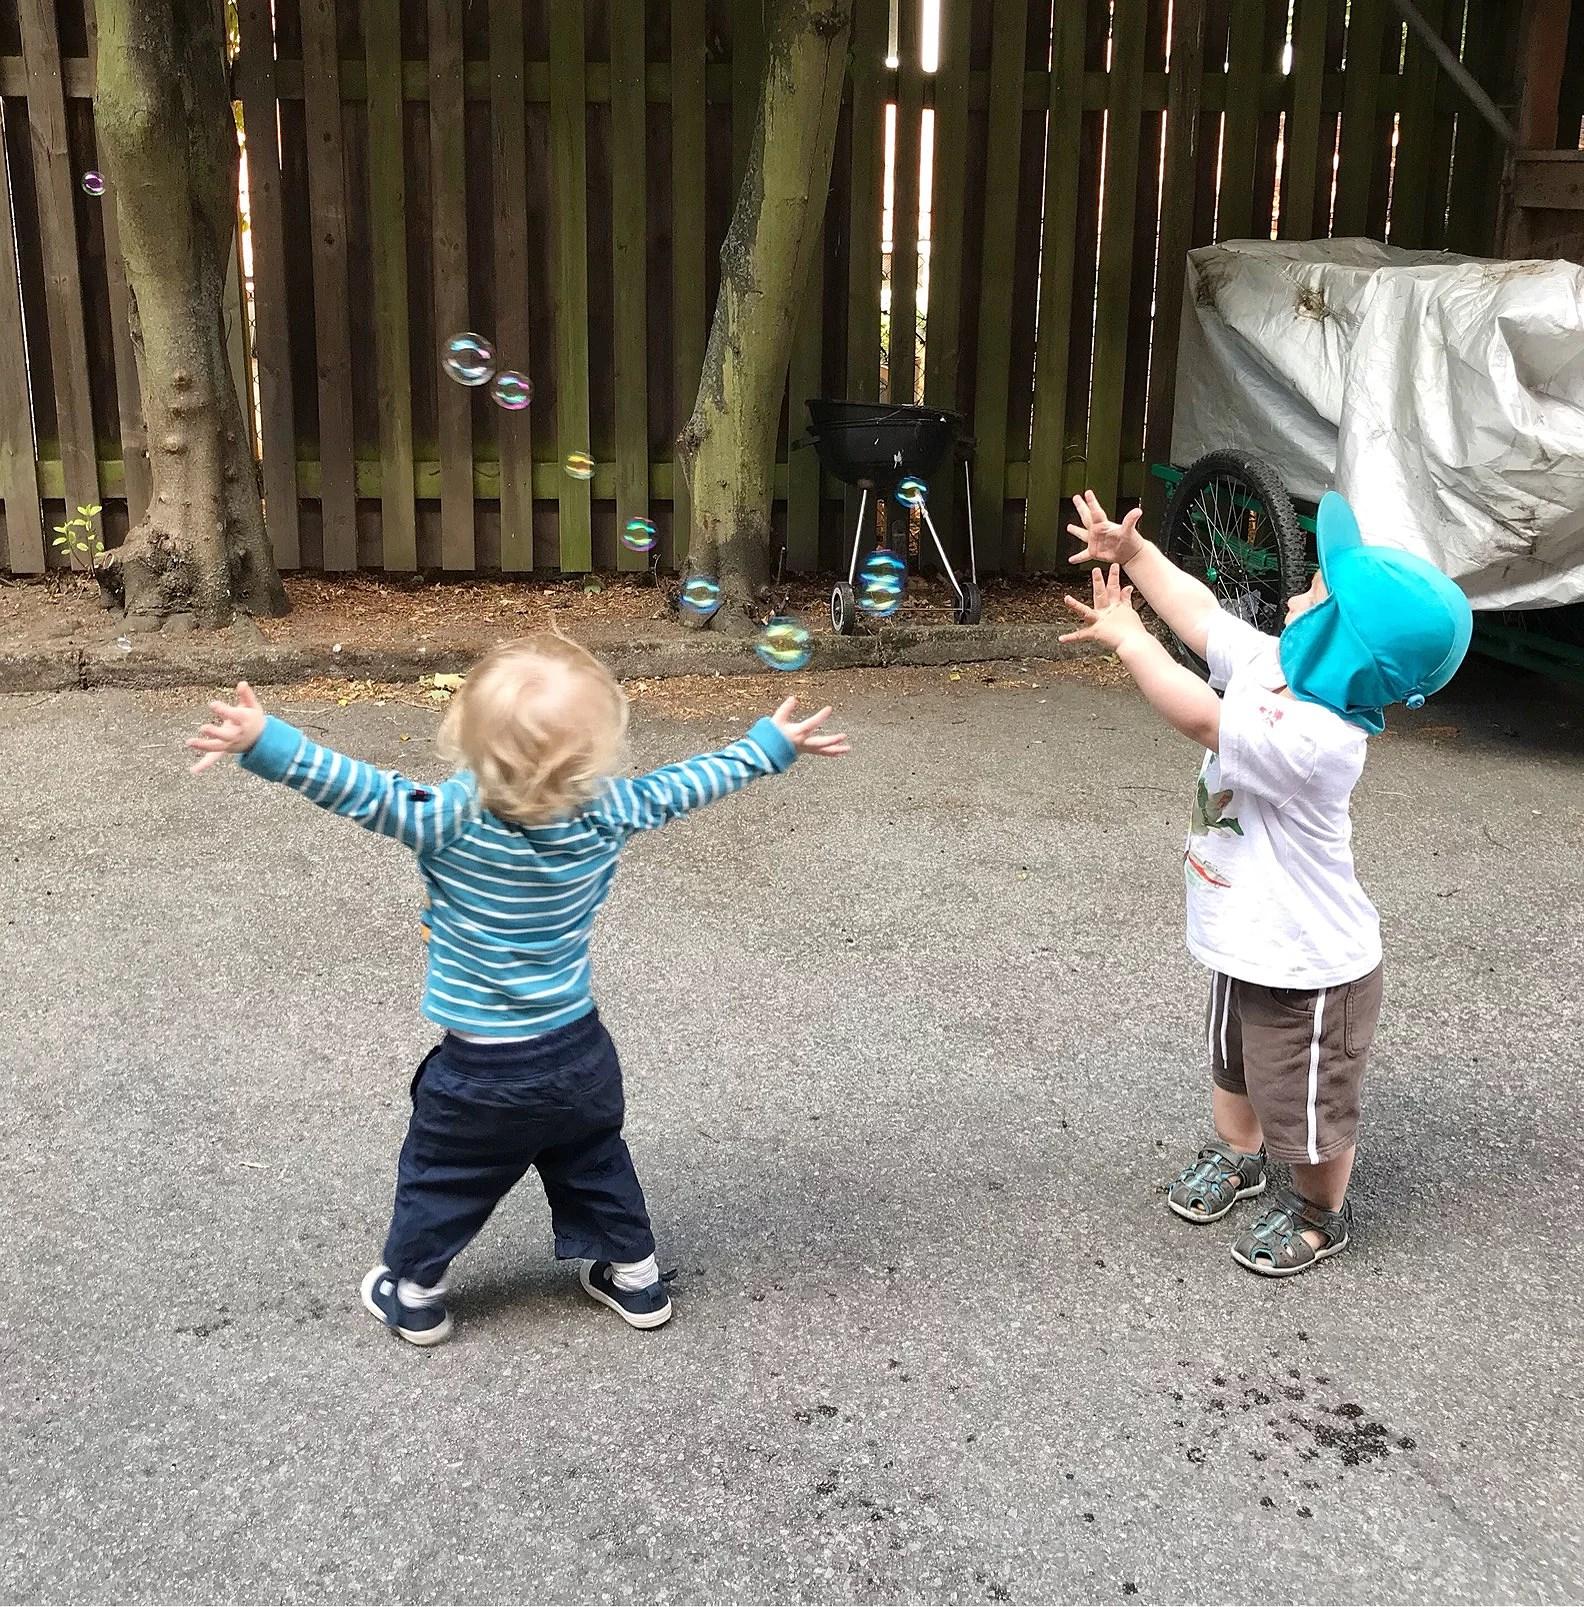 Leka med kompis & fira semestern!